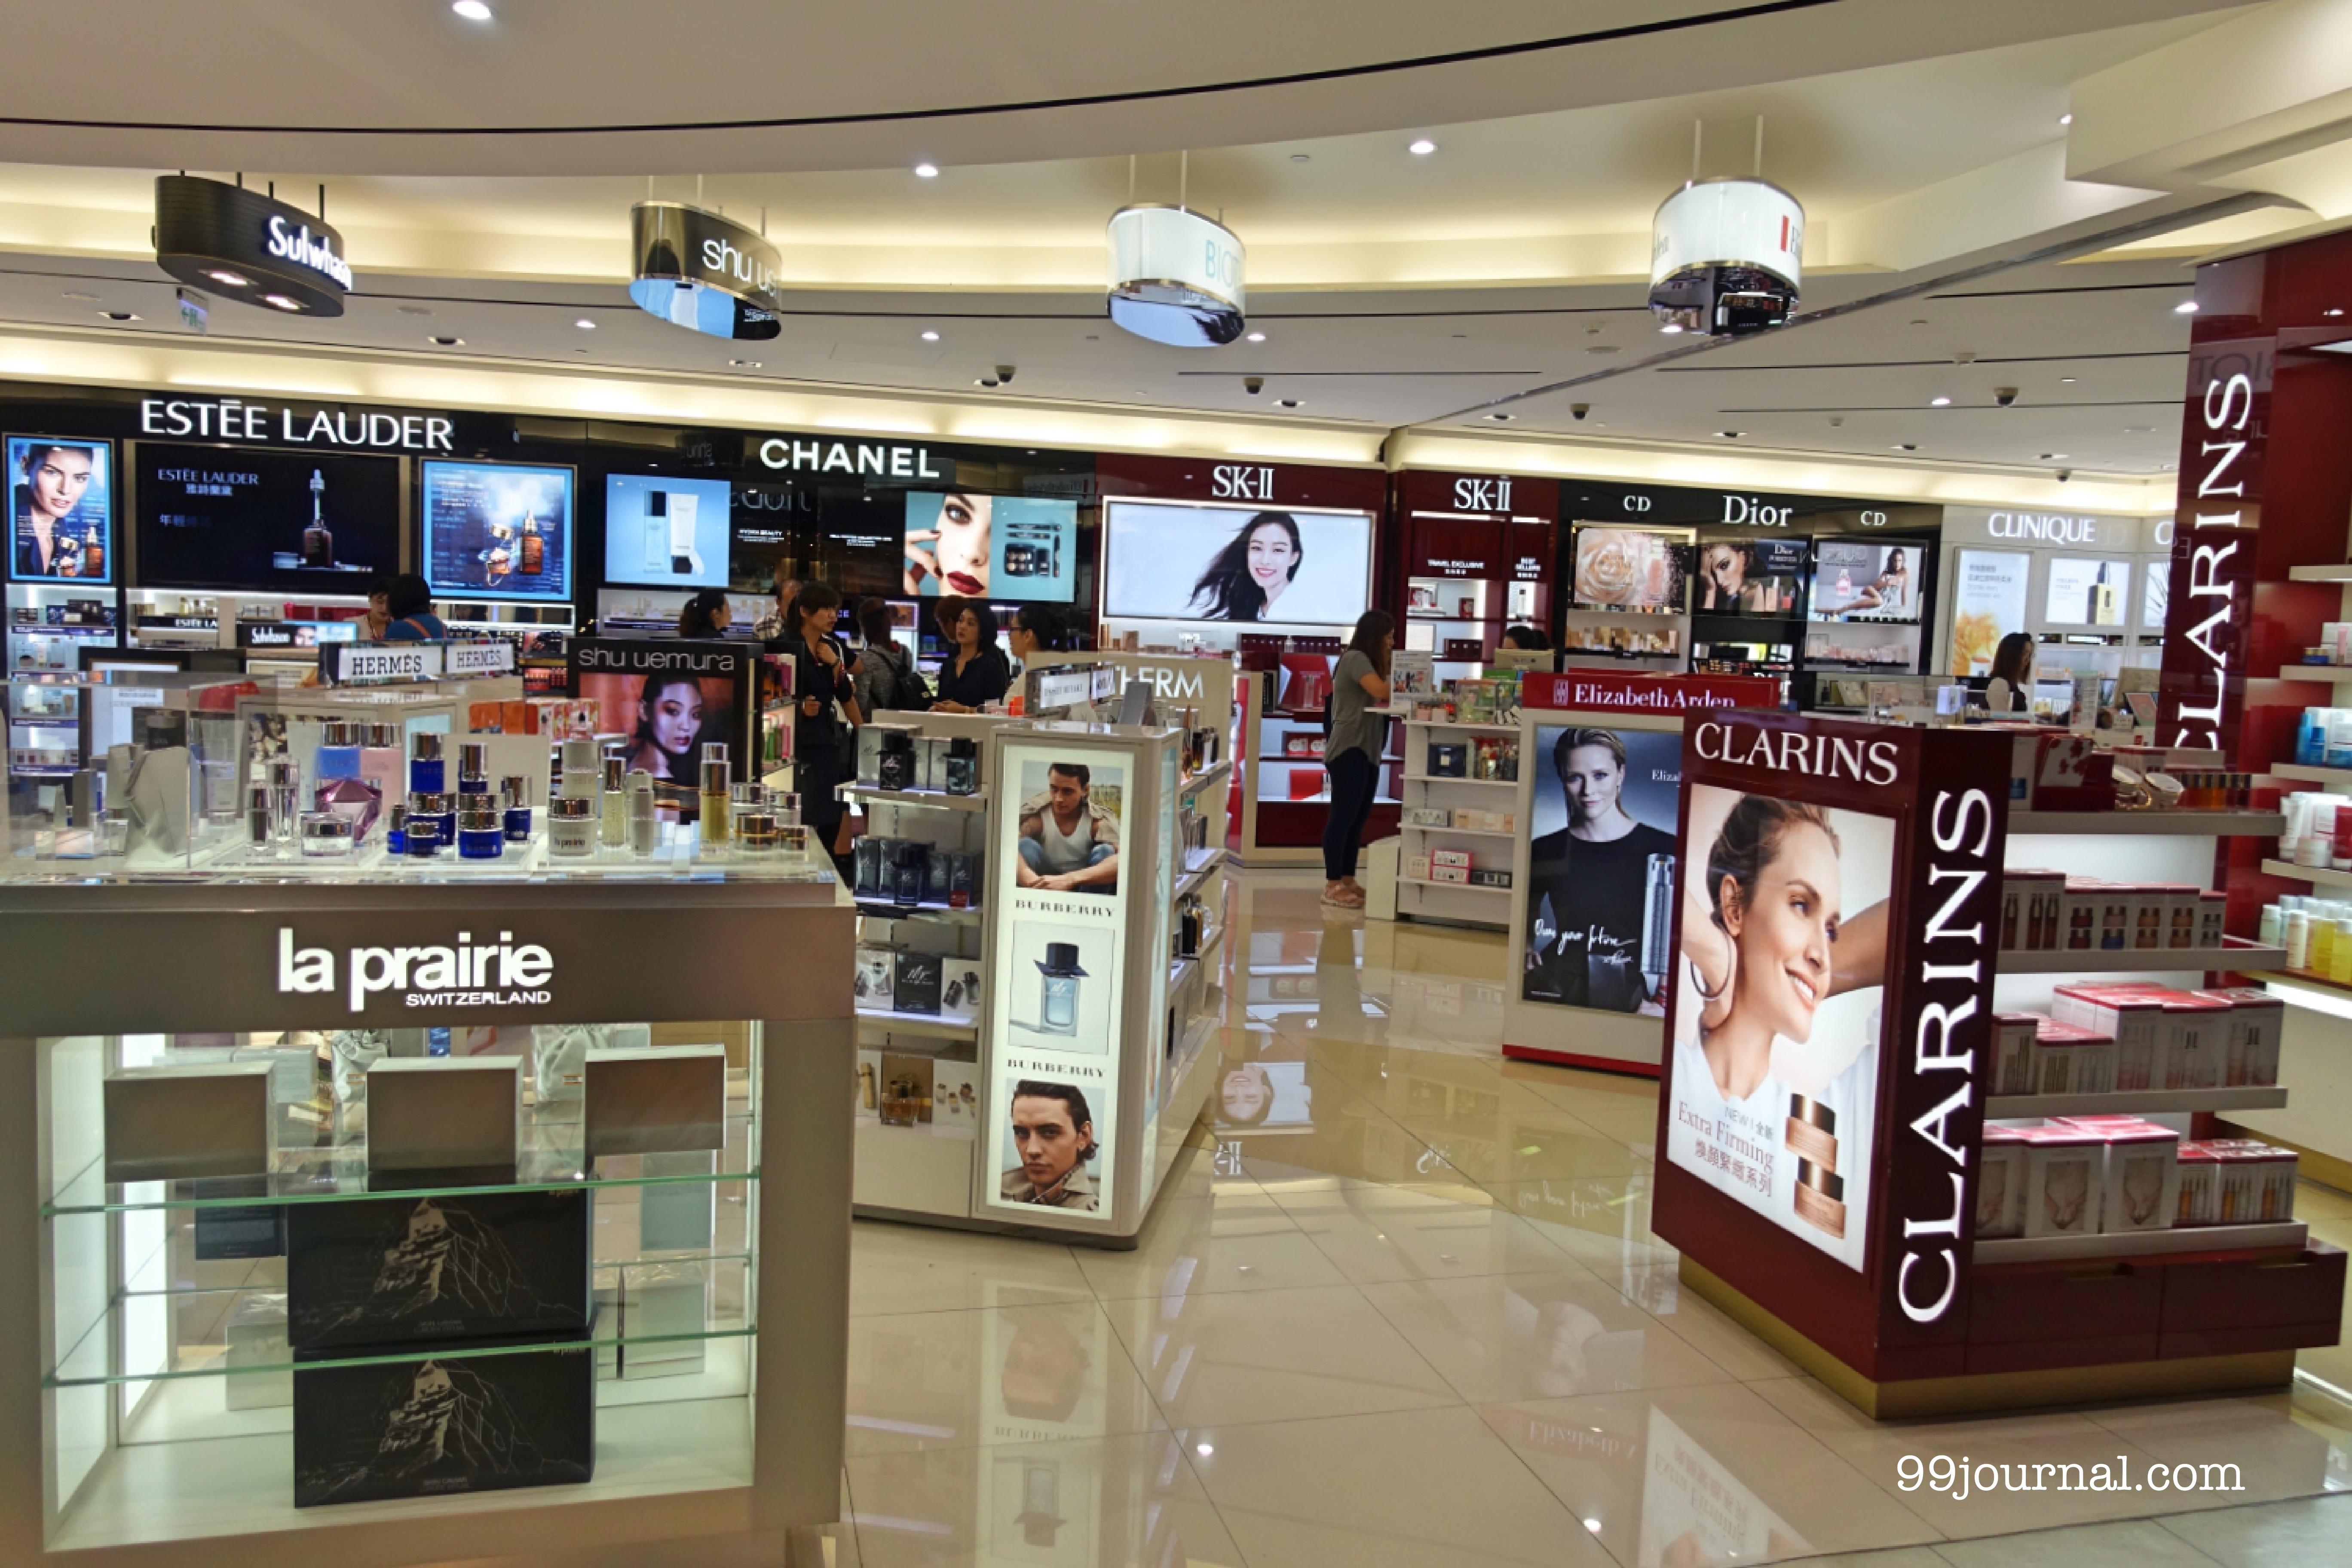 高雄空港内の化粧品売り場の店内の画像